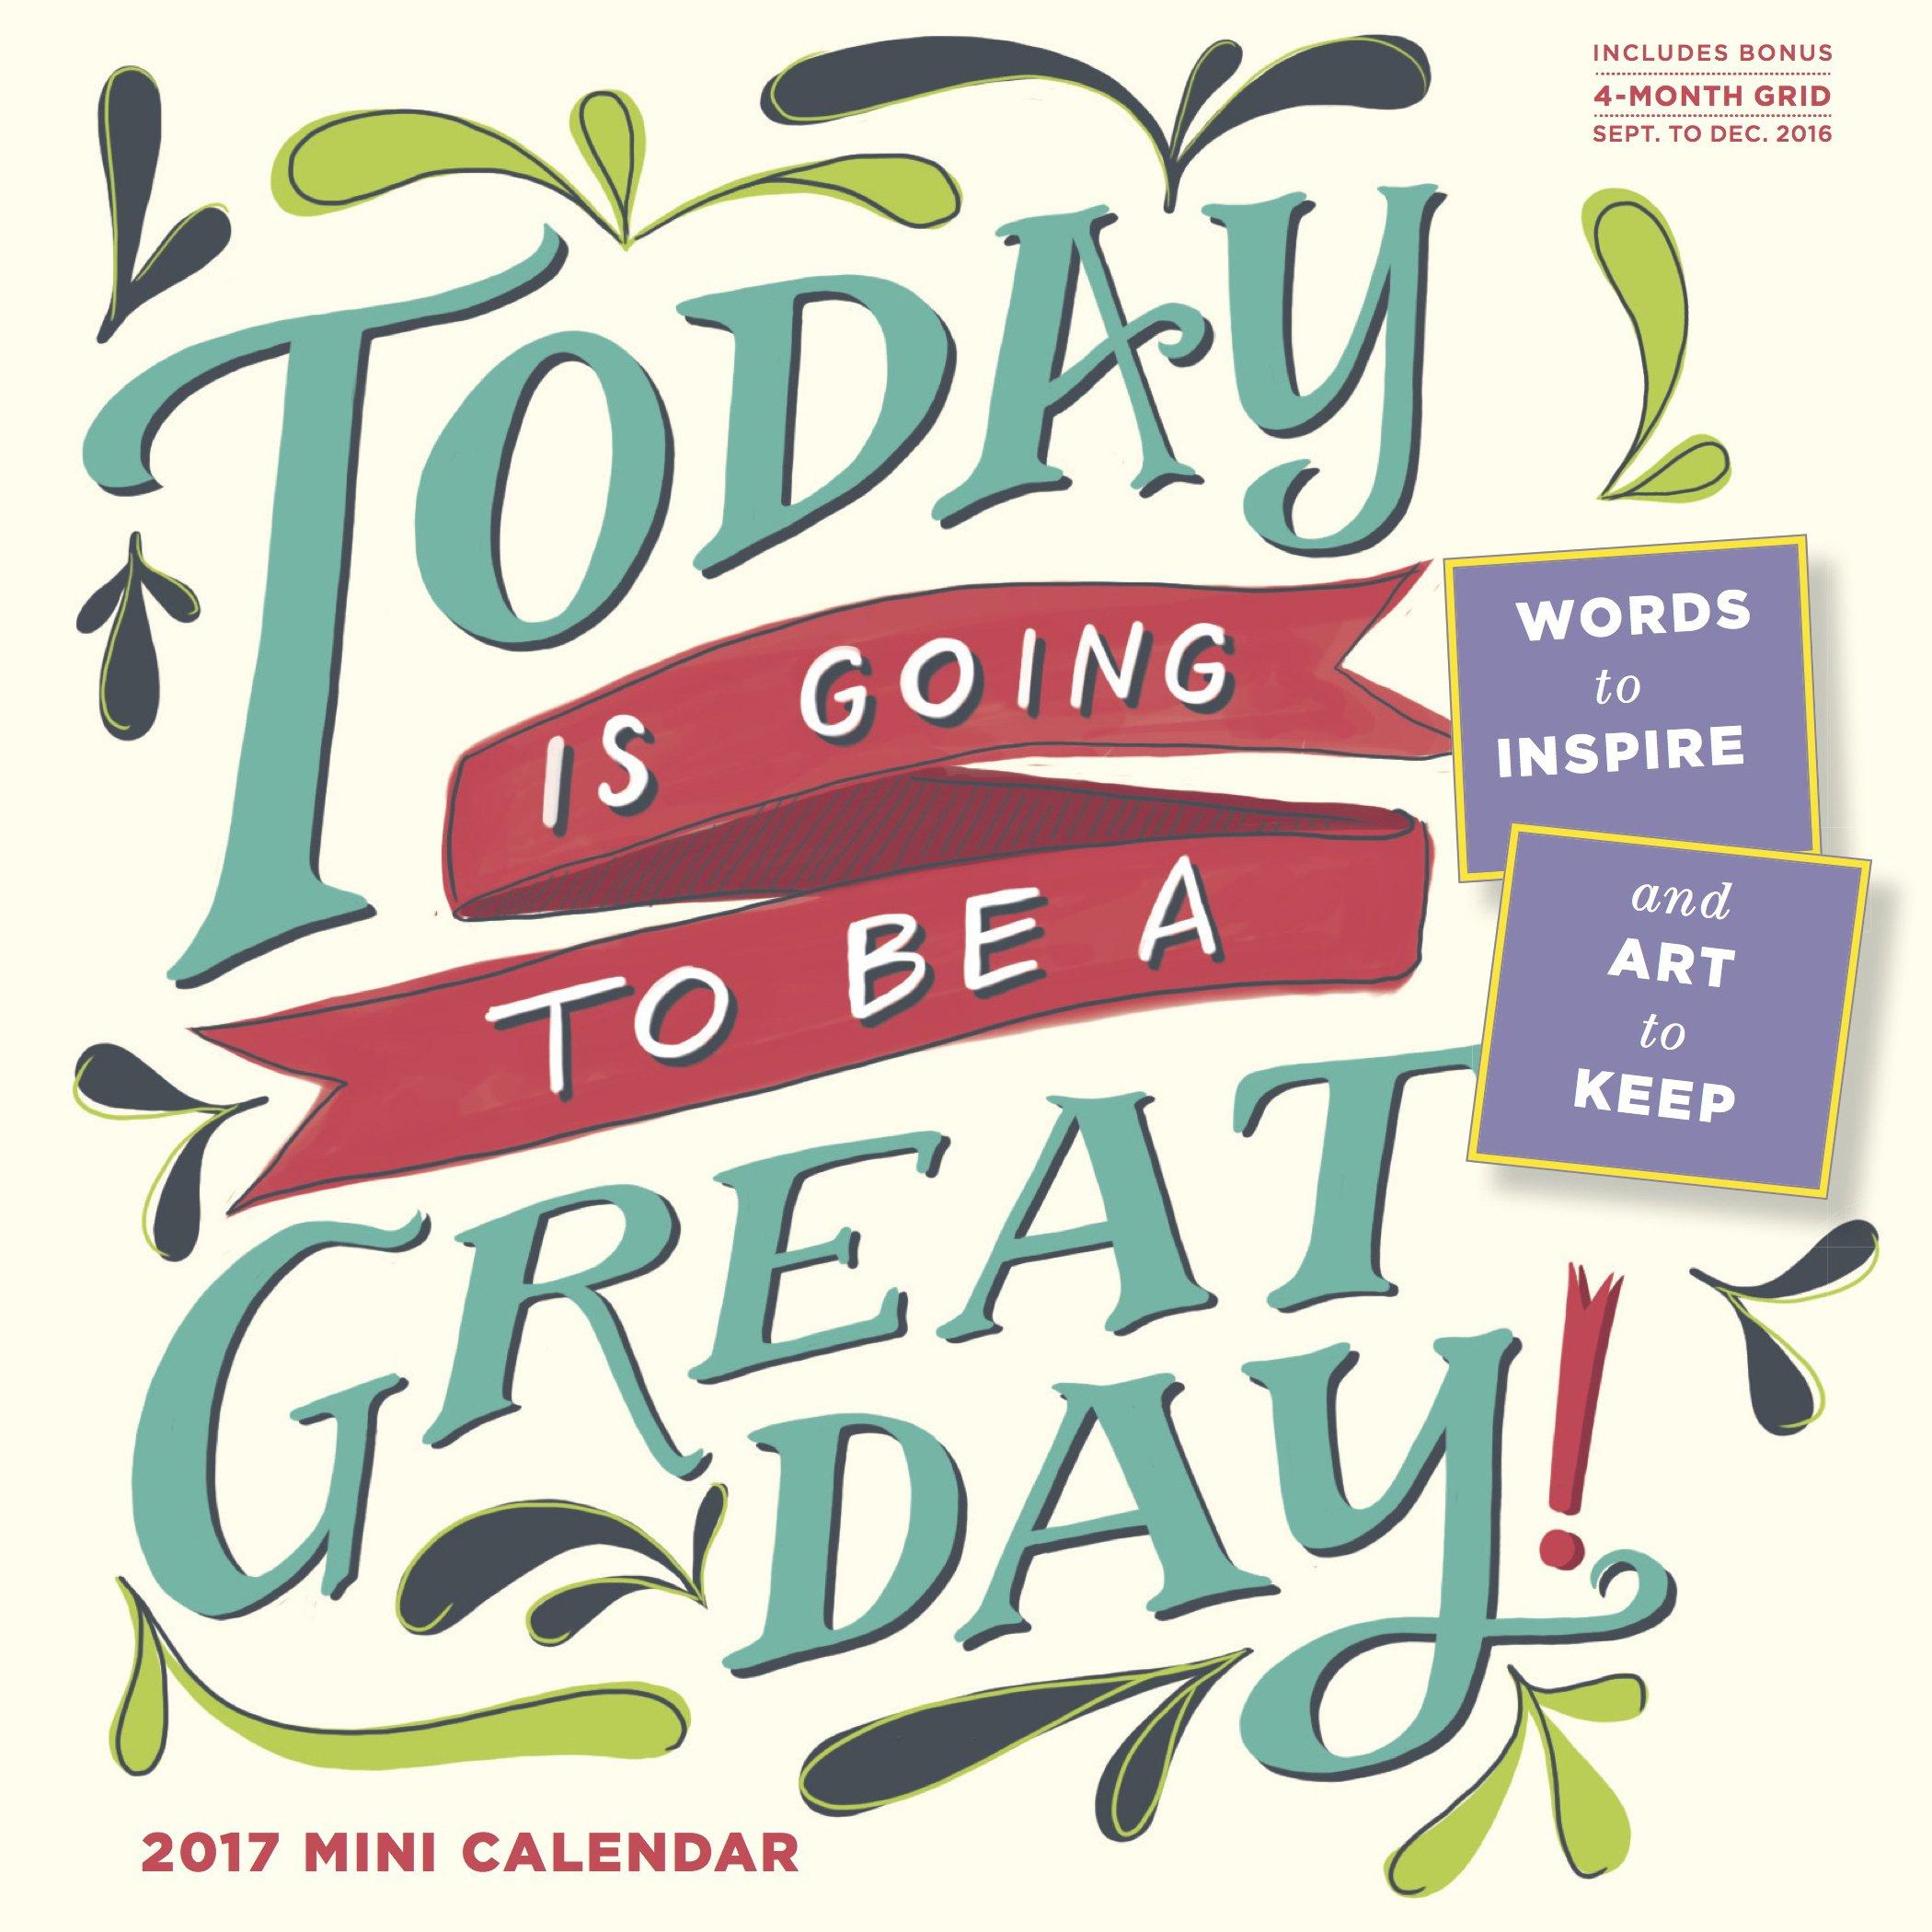 Today Going Great Mini Calendar 2017